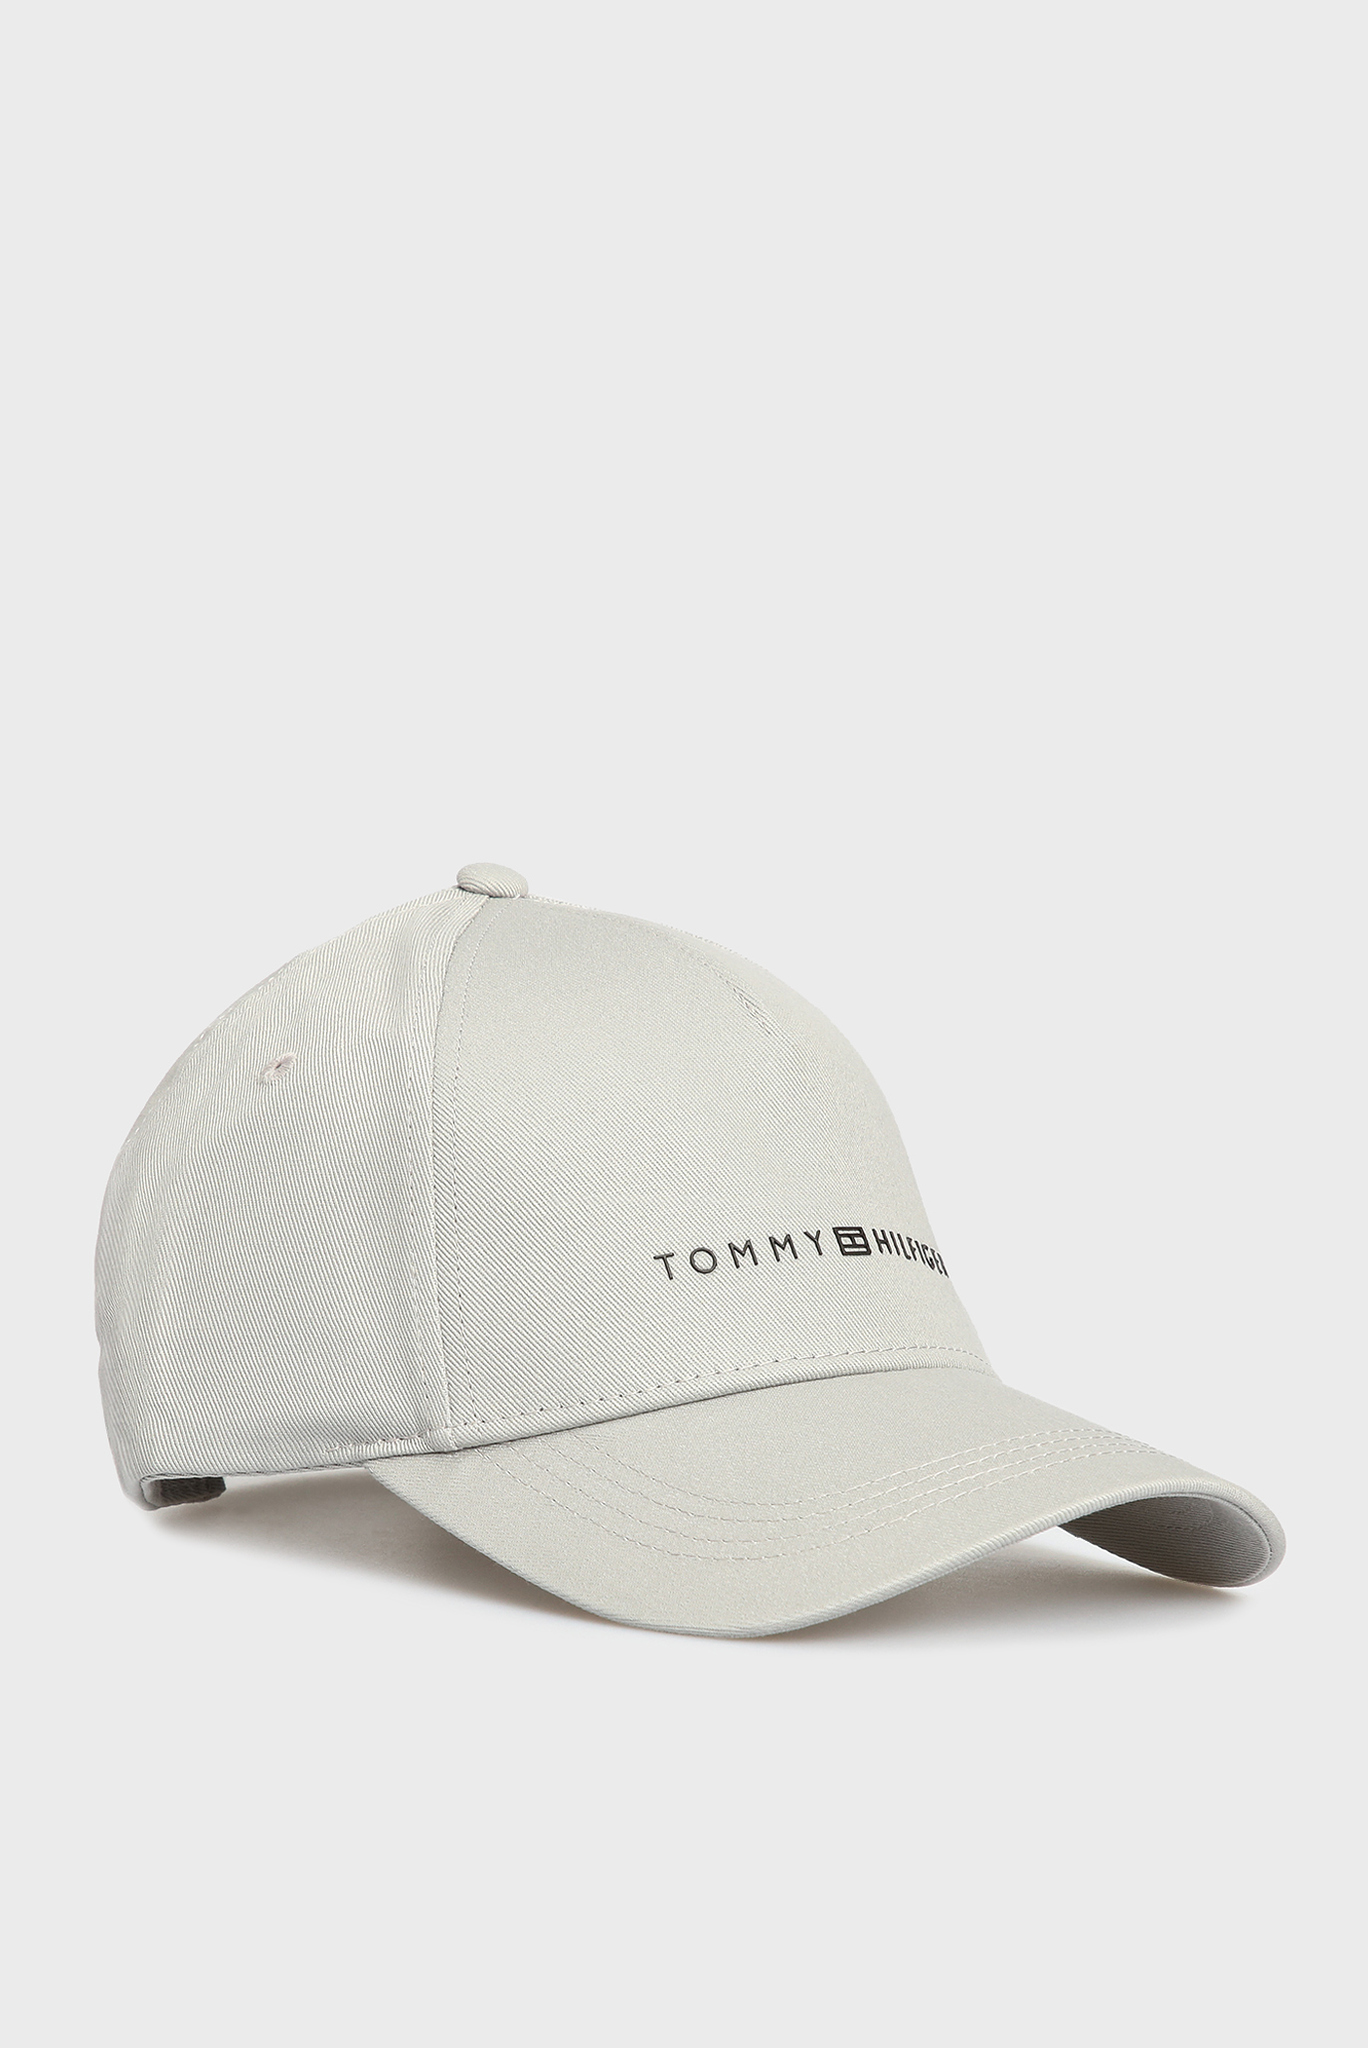 Мужская серая кепка UPTOWN Tommy Hilfiger